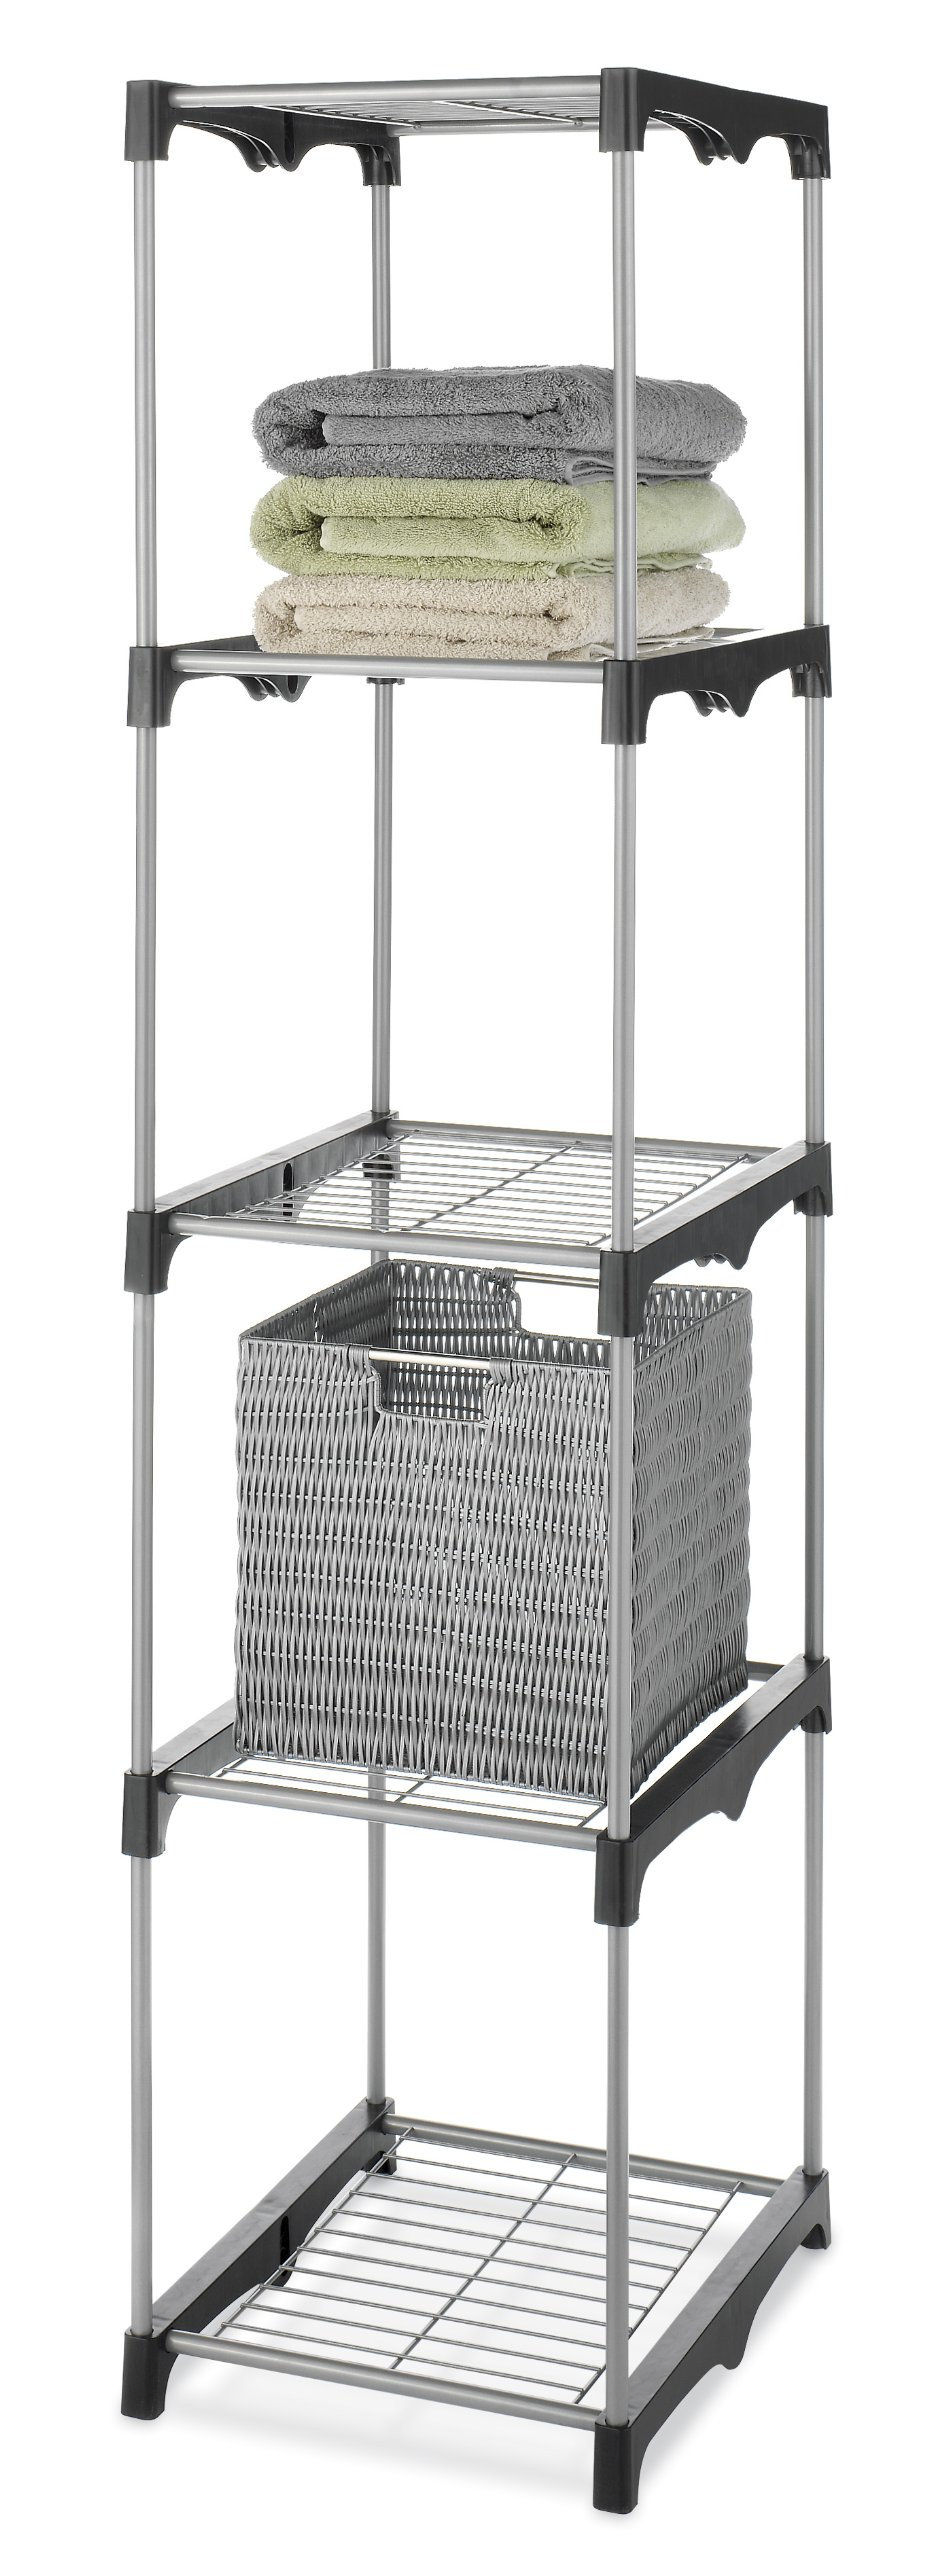 Whitmor 5 Tier Shelf Tower - Closet Storage Organizer